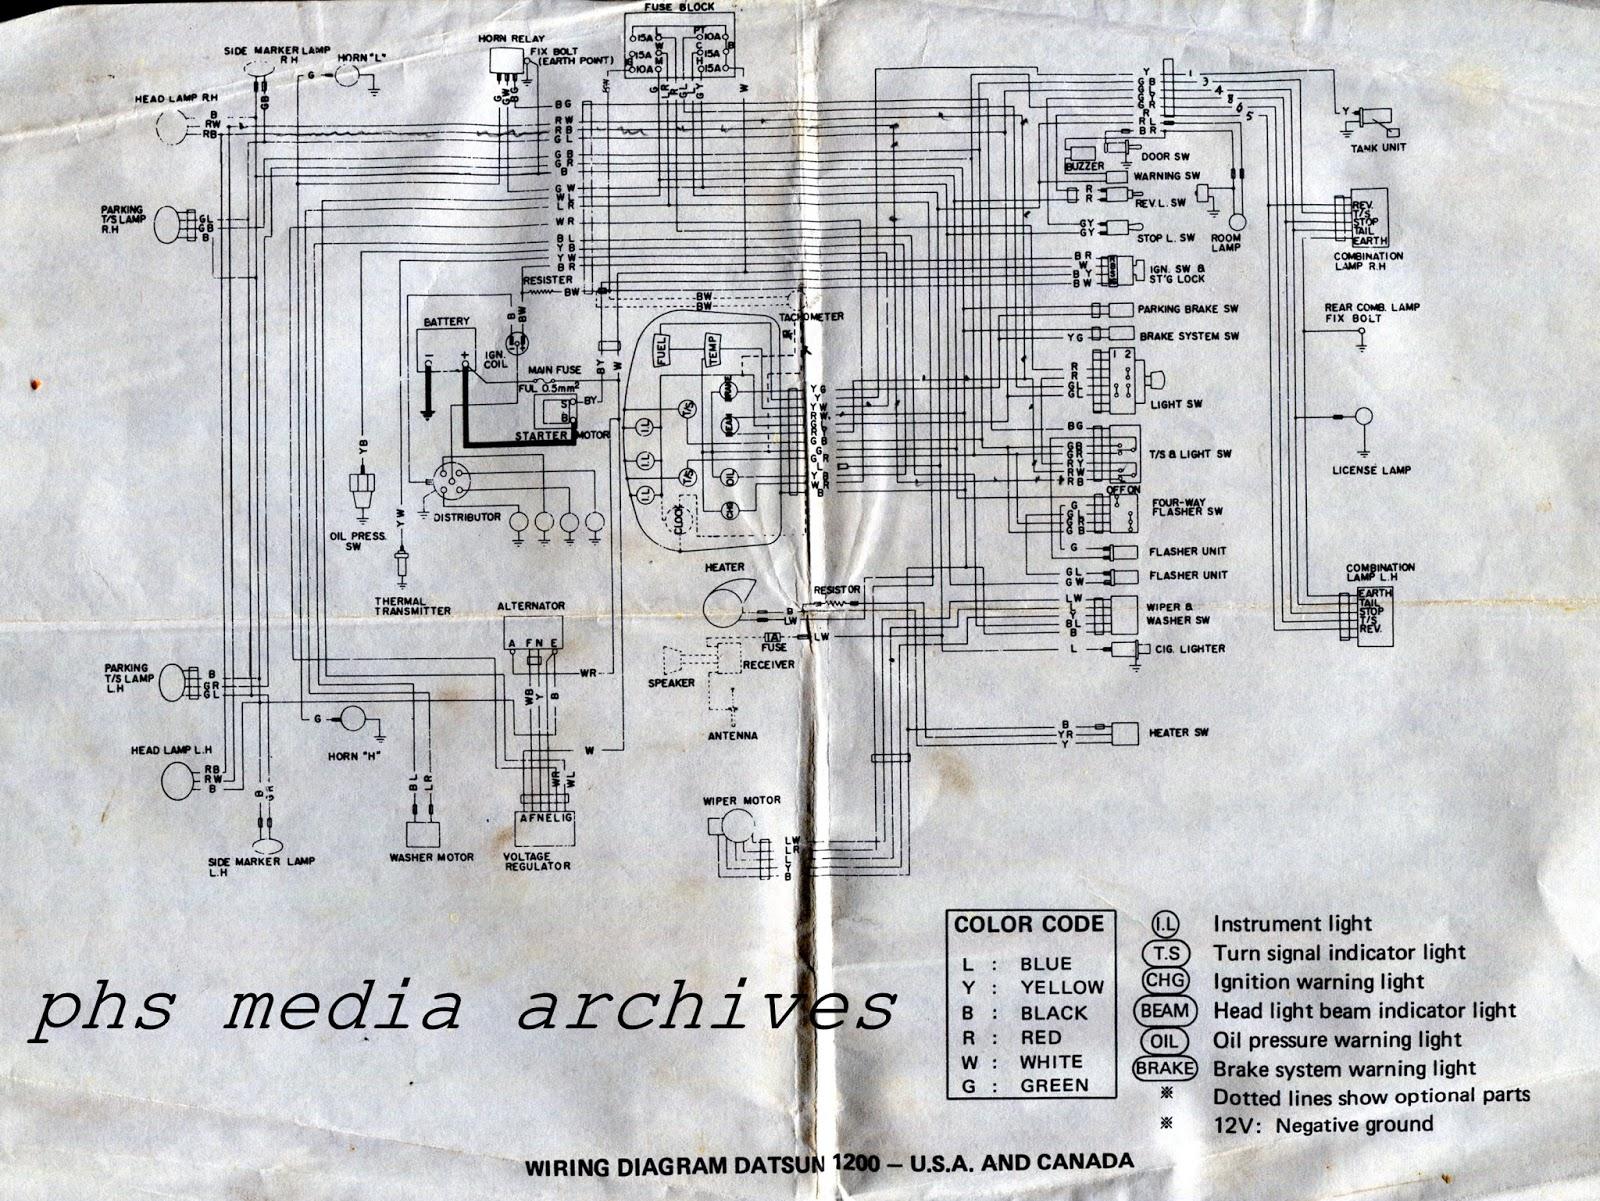 1971 Datsun 510 Wiring Diagram 2000 Chrysler 300m Engine 1200 Great Installation Of Phs Tech Series 72 Diagrams Rh Phscollectorcarworld Blogspot Com Bakkie